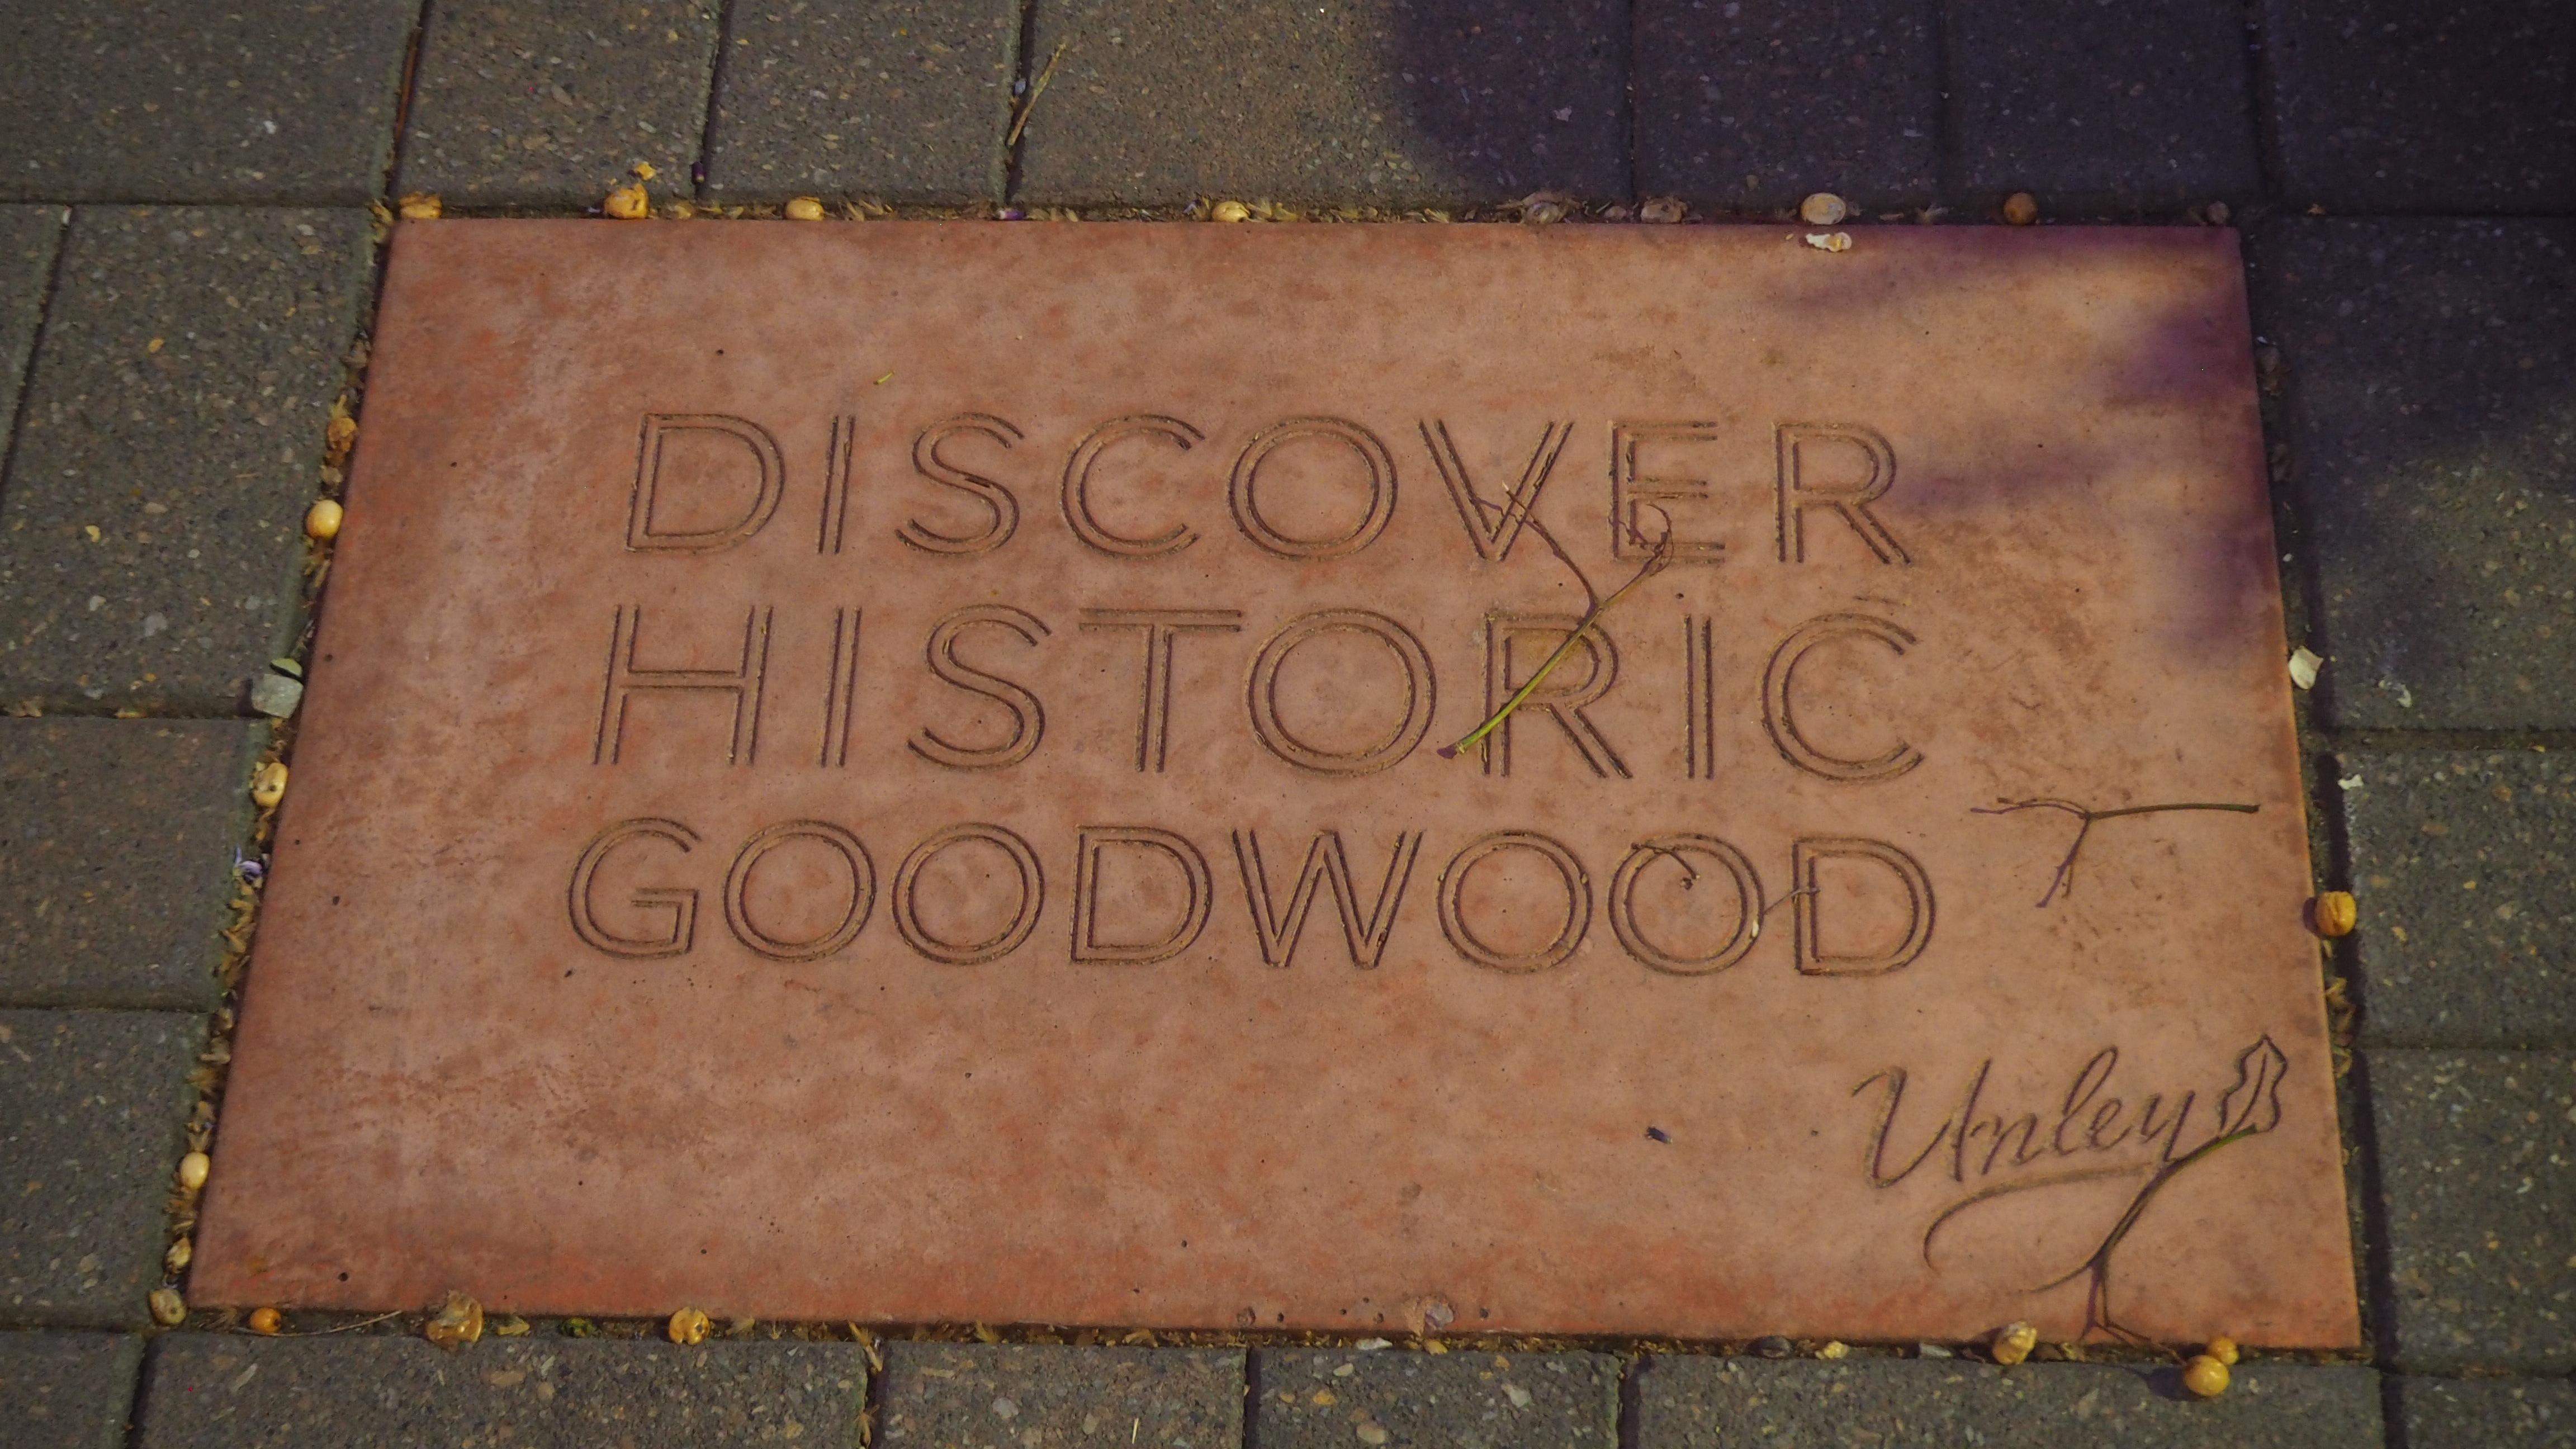 History sign